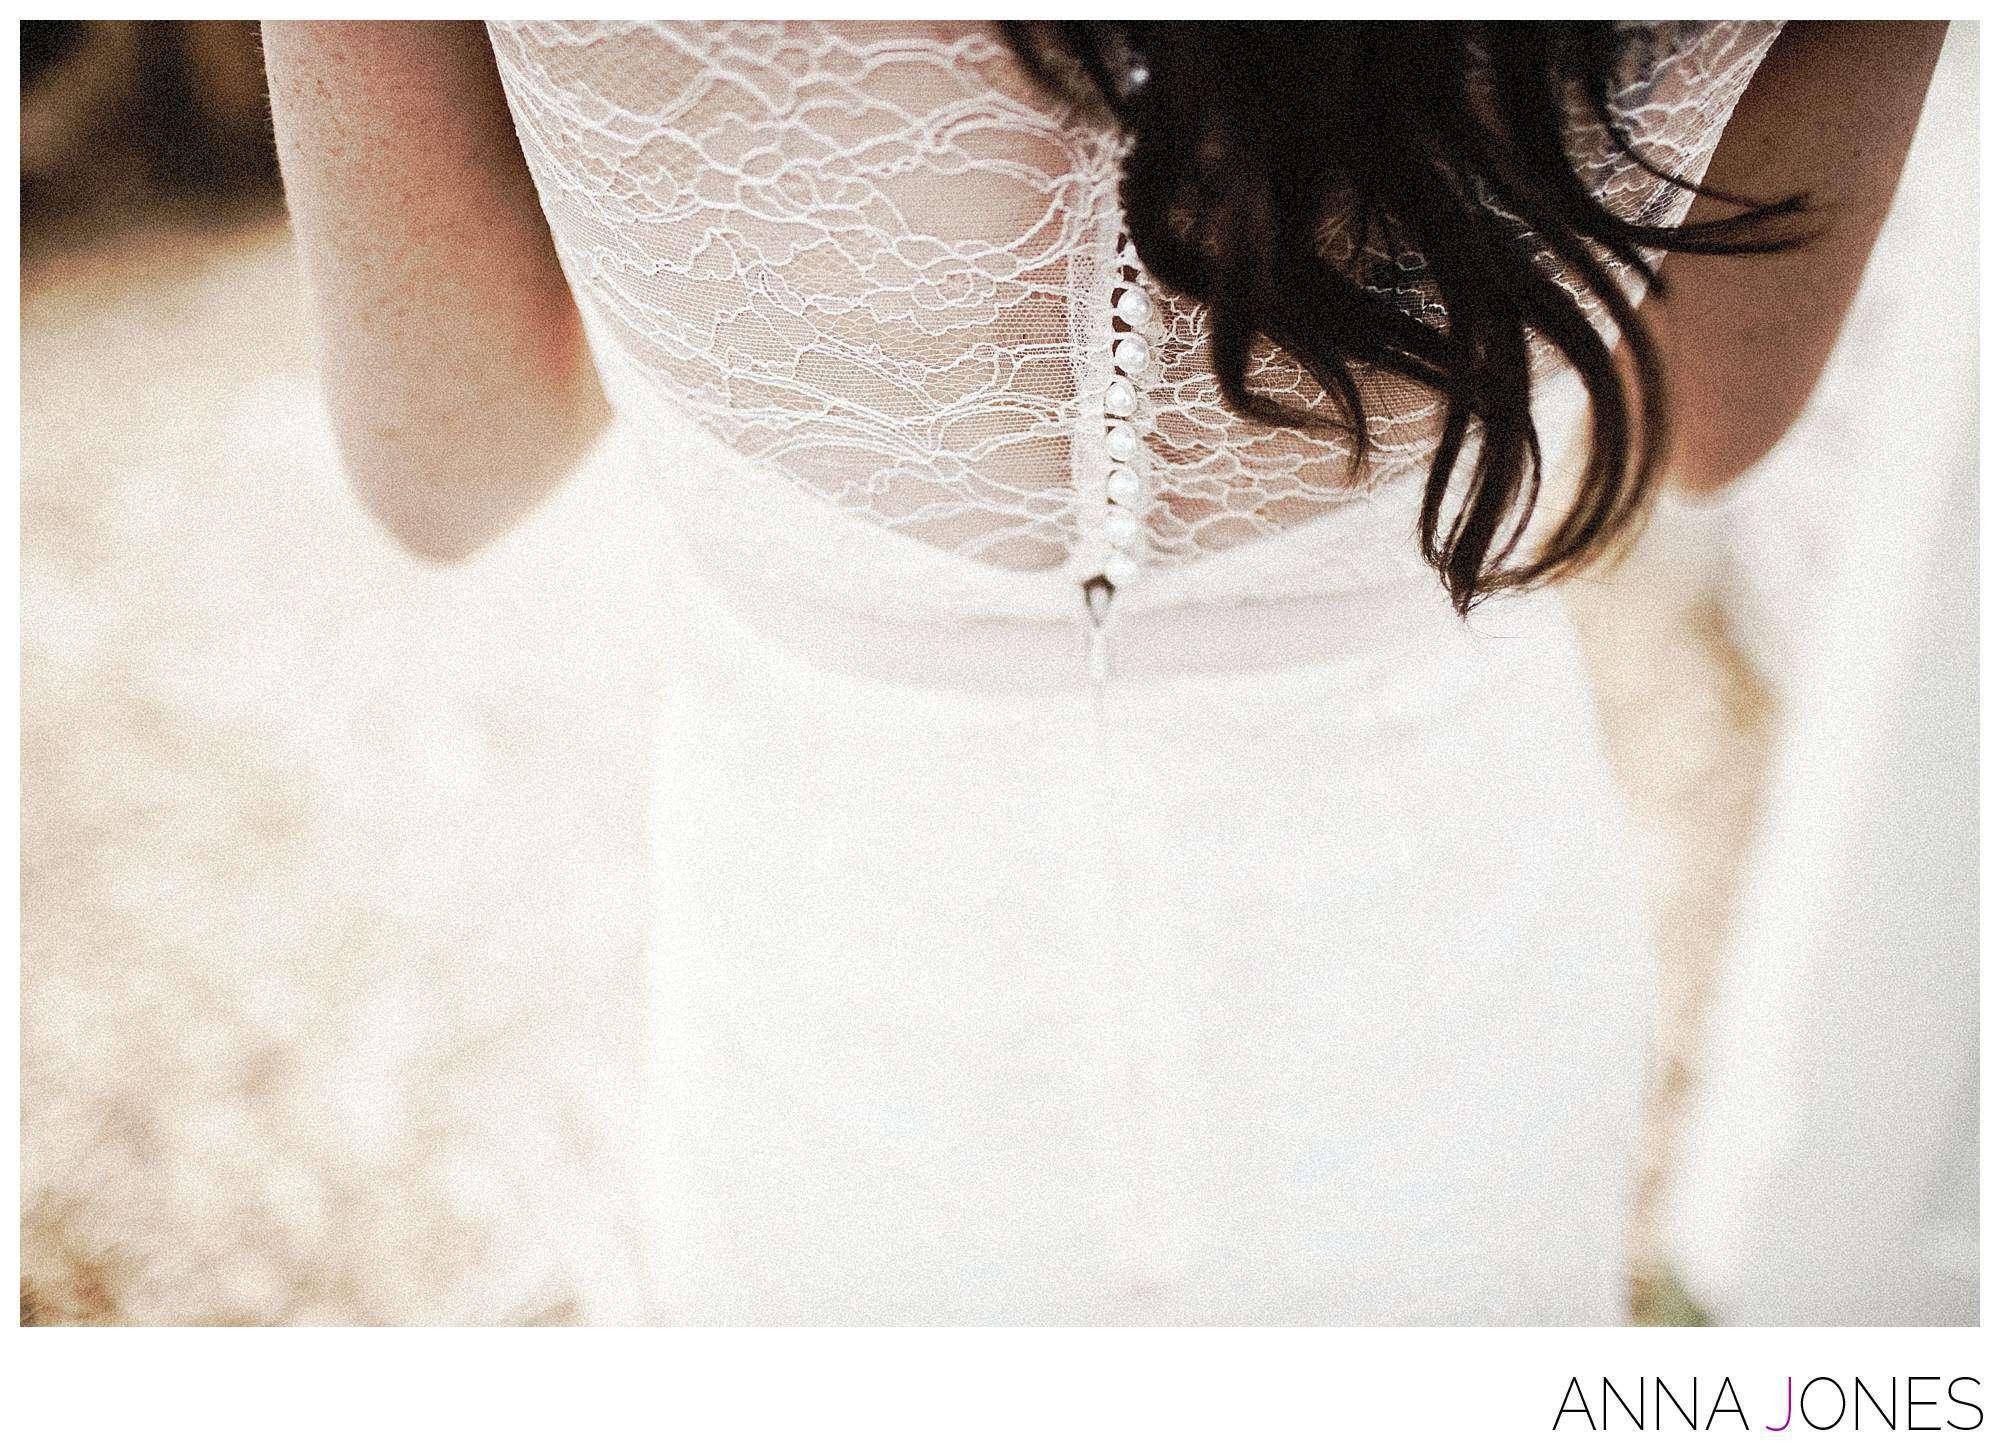 ashlee + danny vansyoc > anna jones wedding + lifestyle photography > (C) www.annajon.es